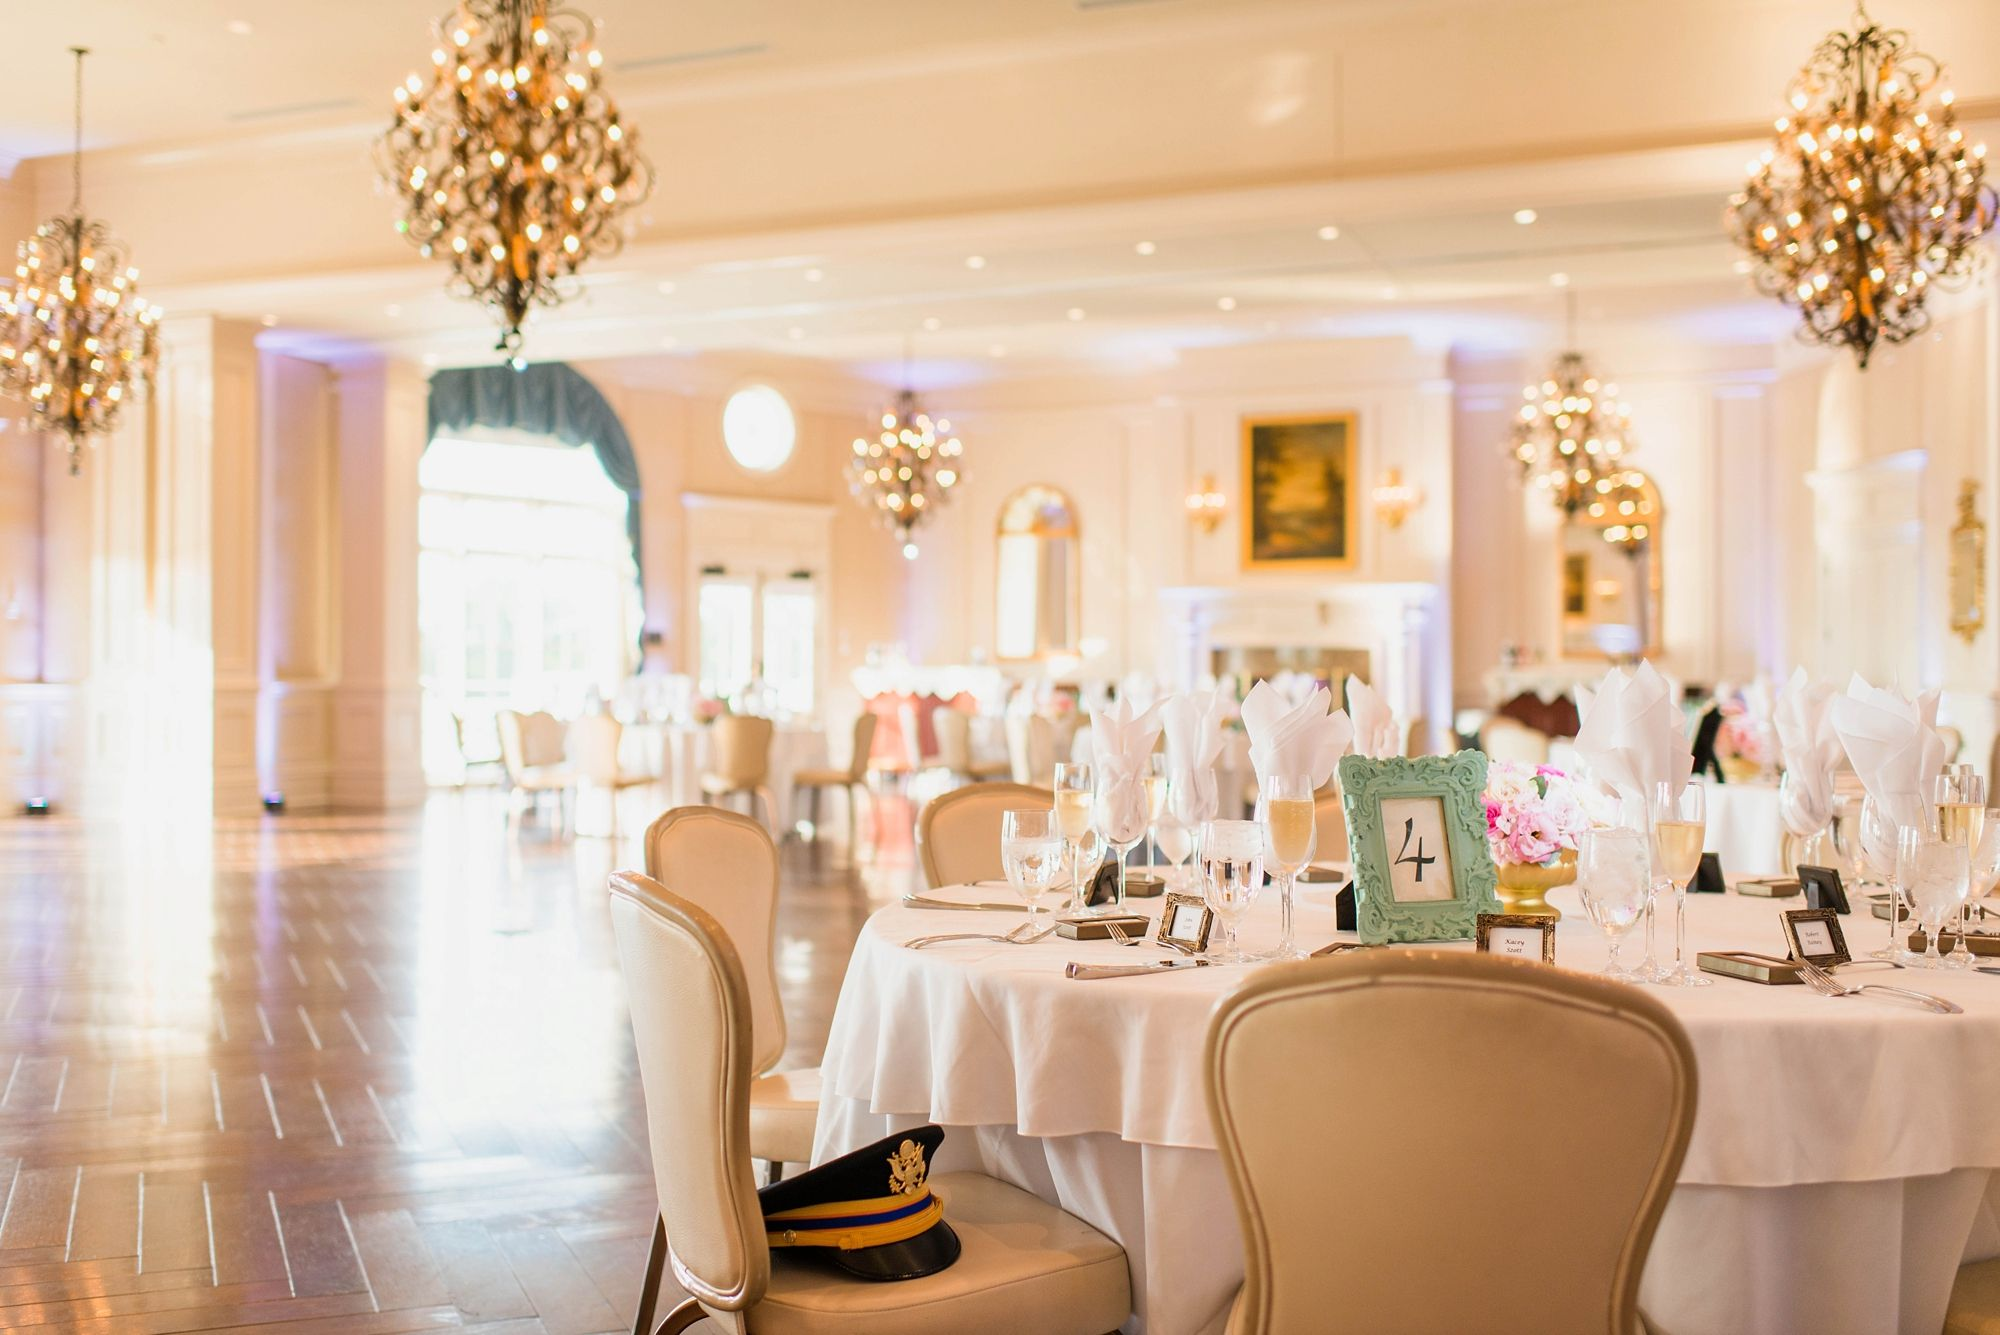 Wedding venues in virginia beach va  Old Ranch Country Club Seal Beach  Wedding Venues  Pinterest